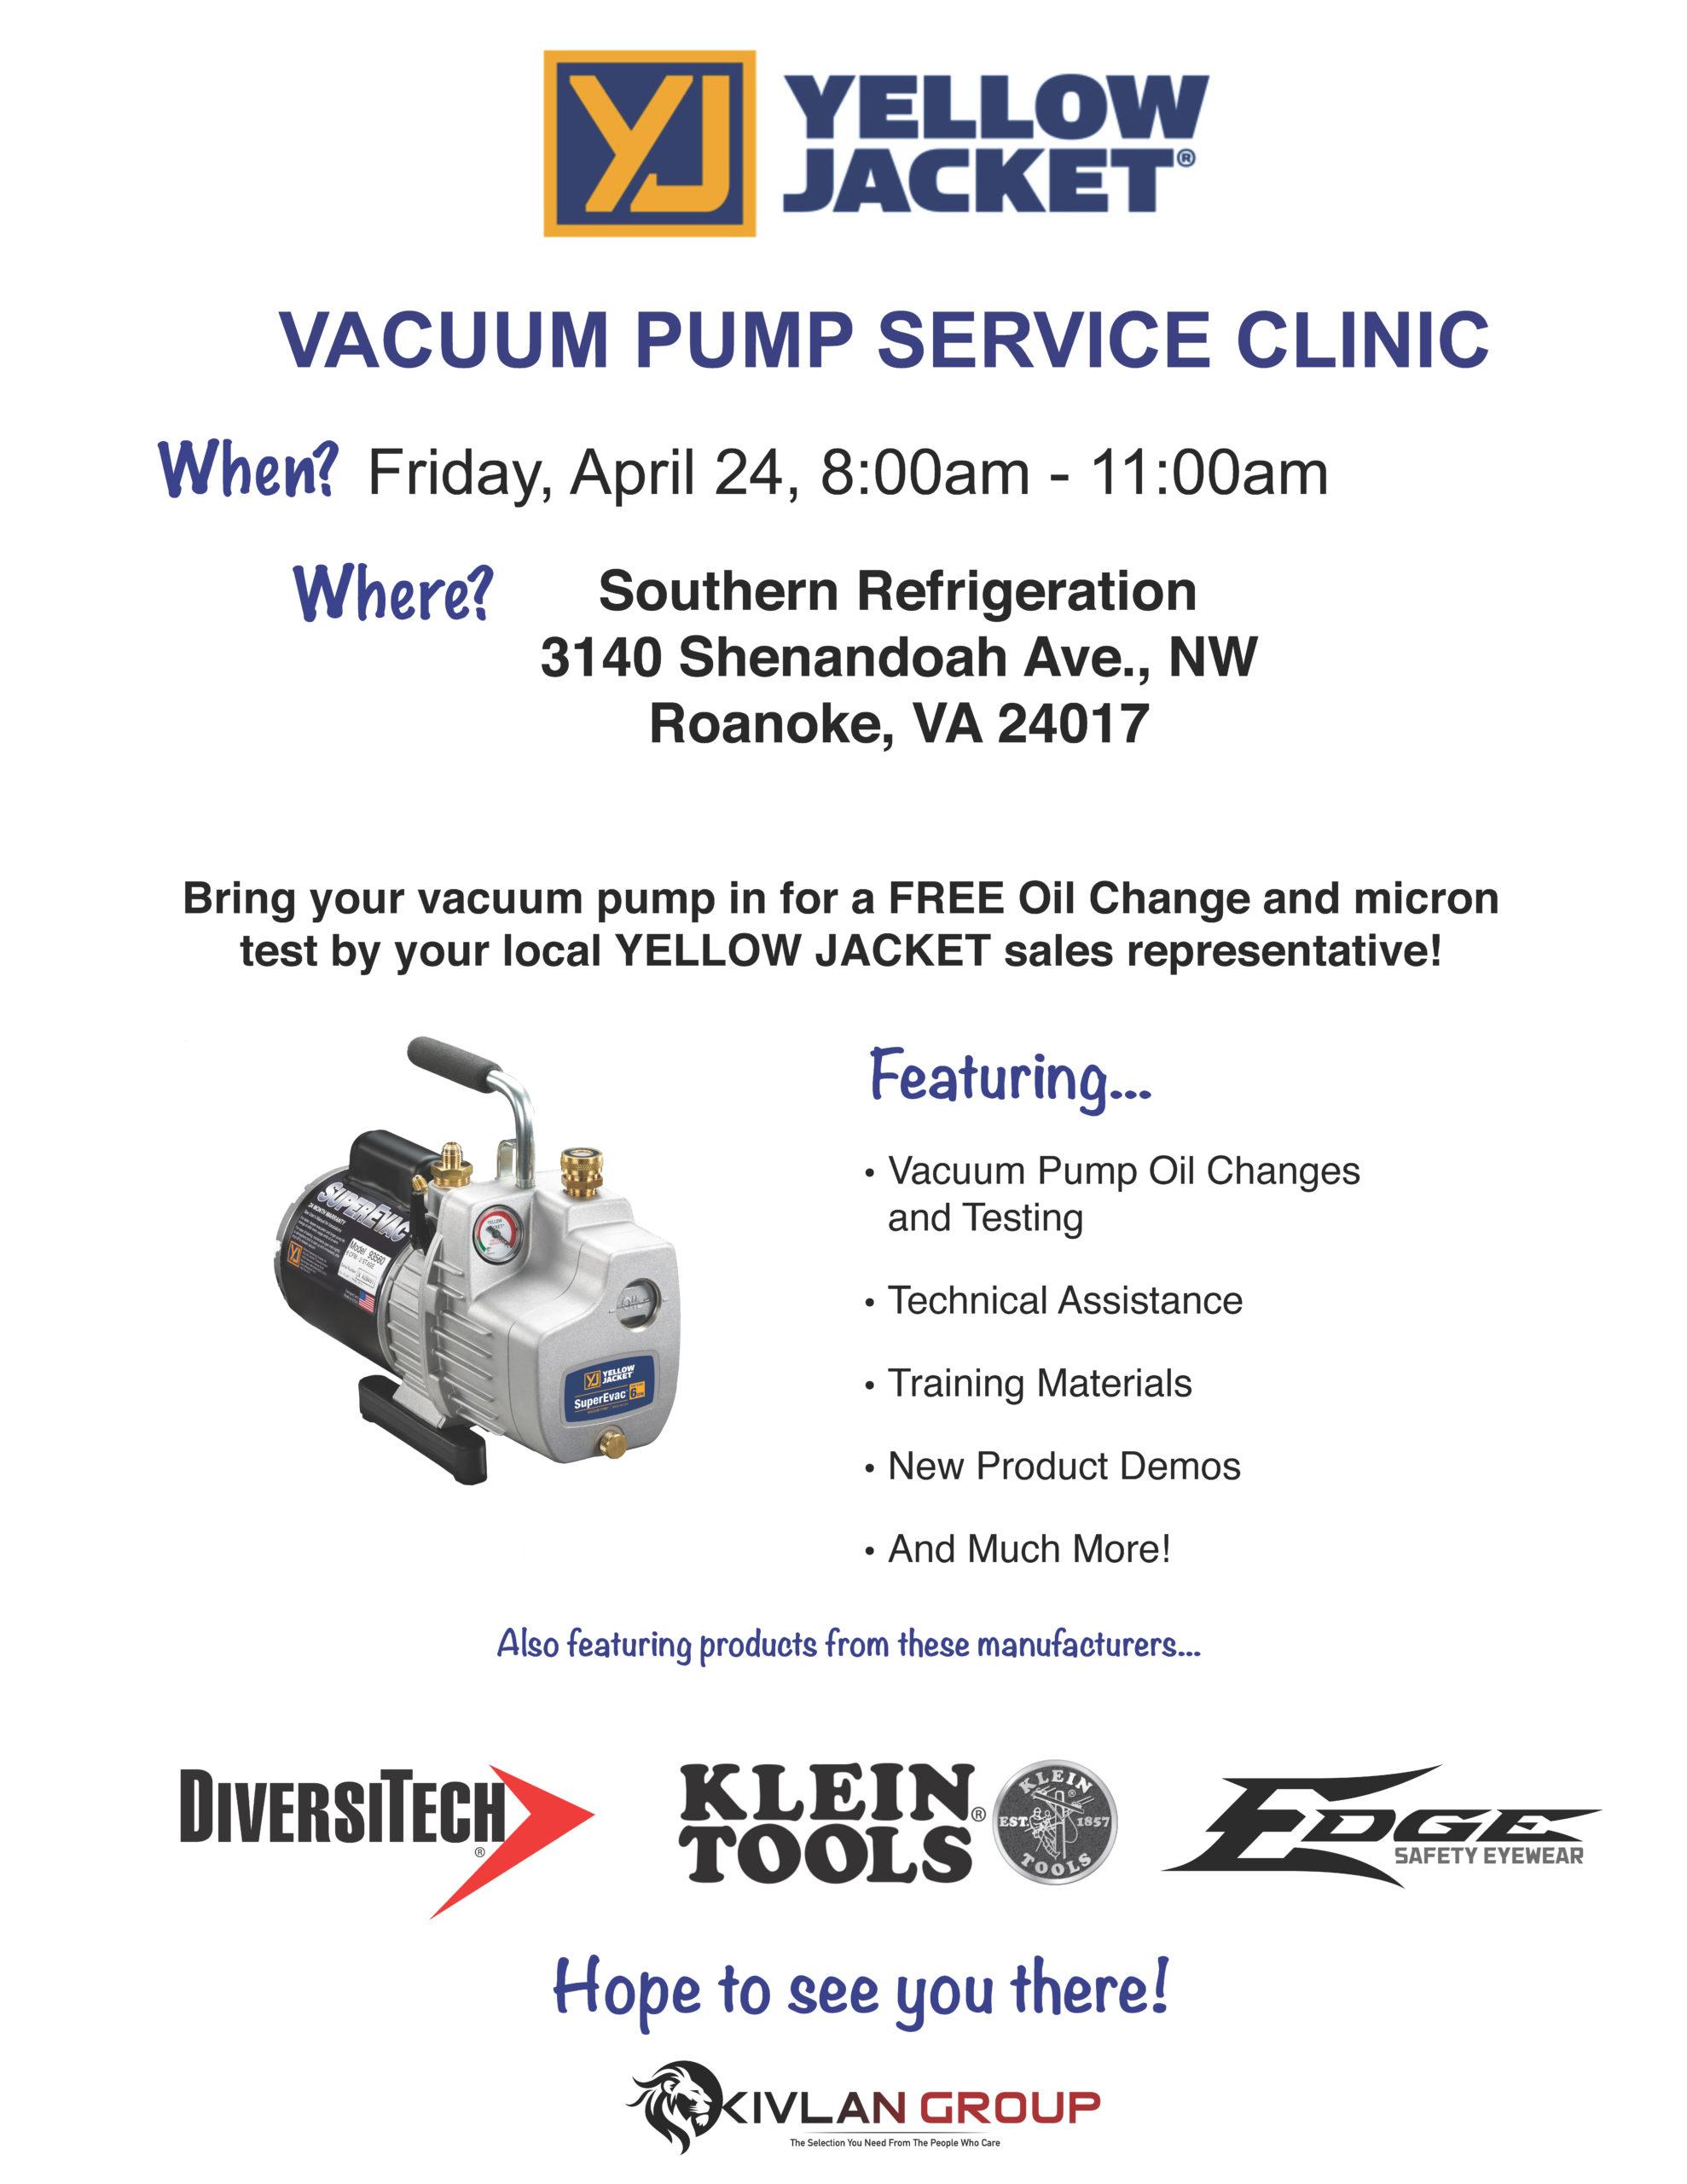 Yellow Jacket Vacuum Pump Service – Roanoke @ Southern Refrigeration - Roanoke